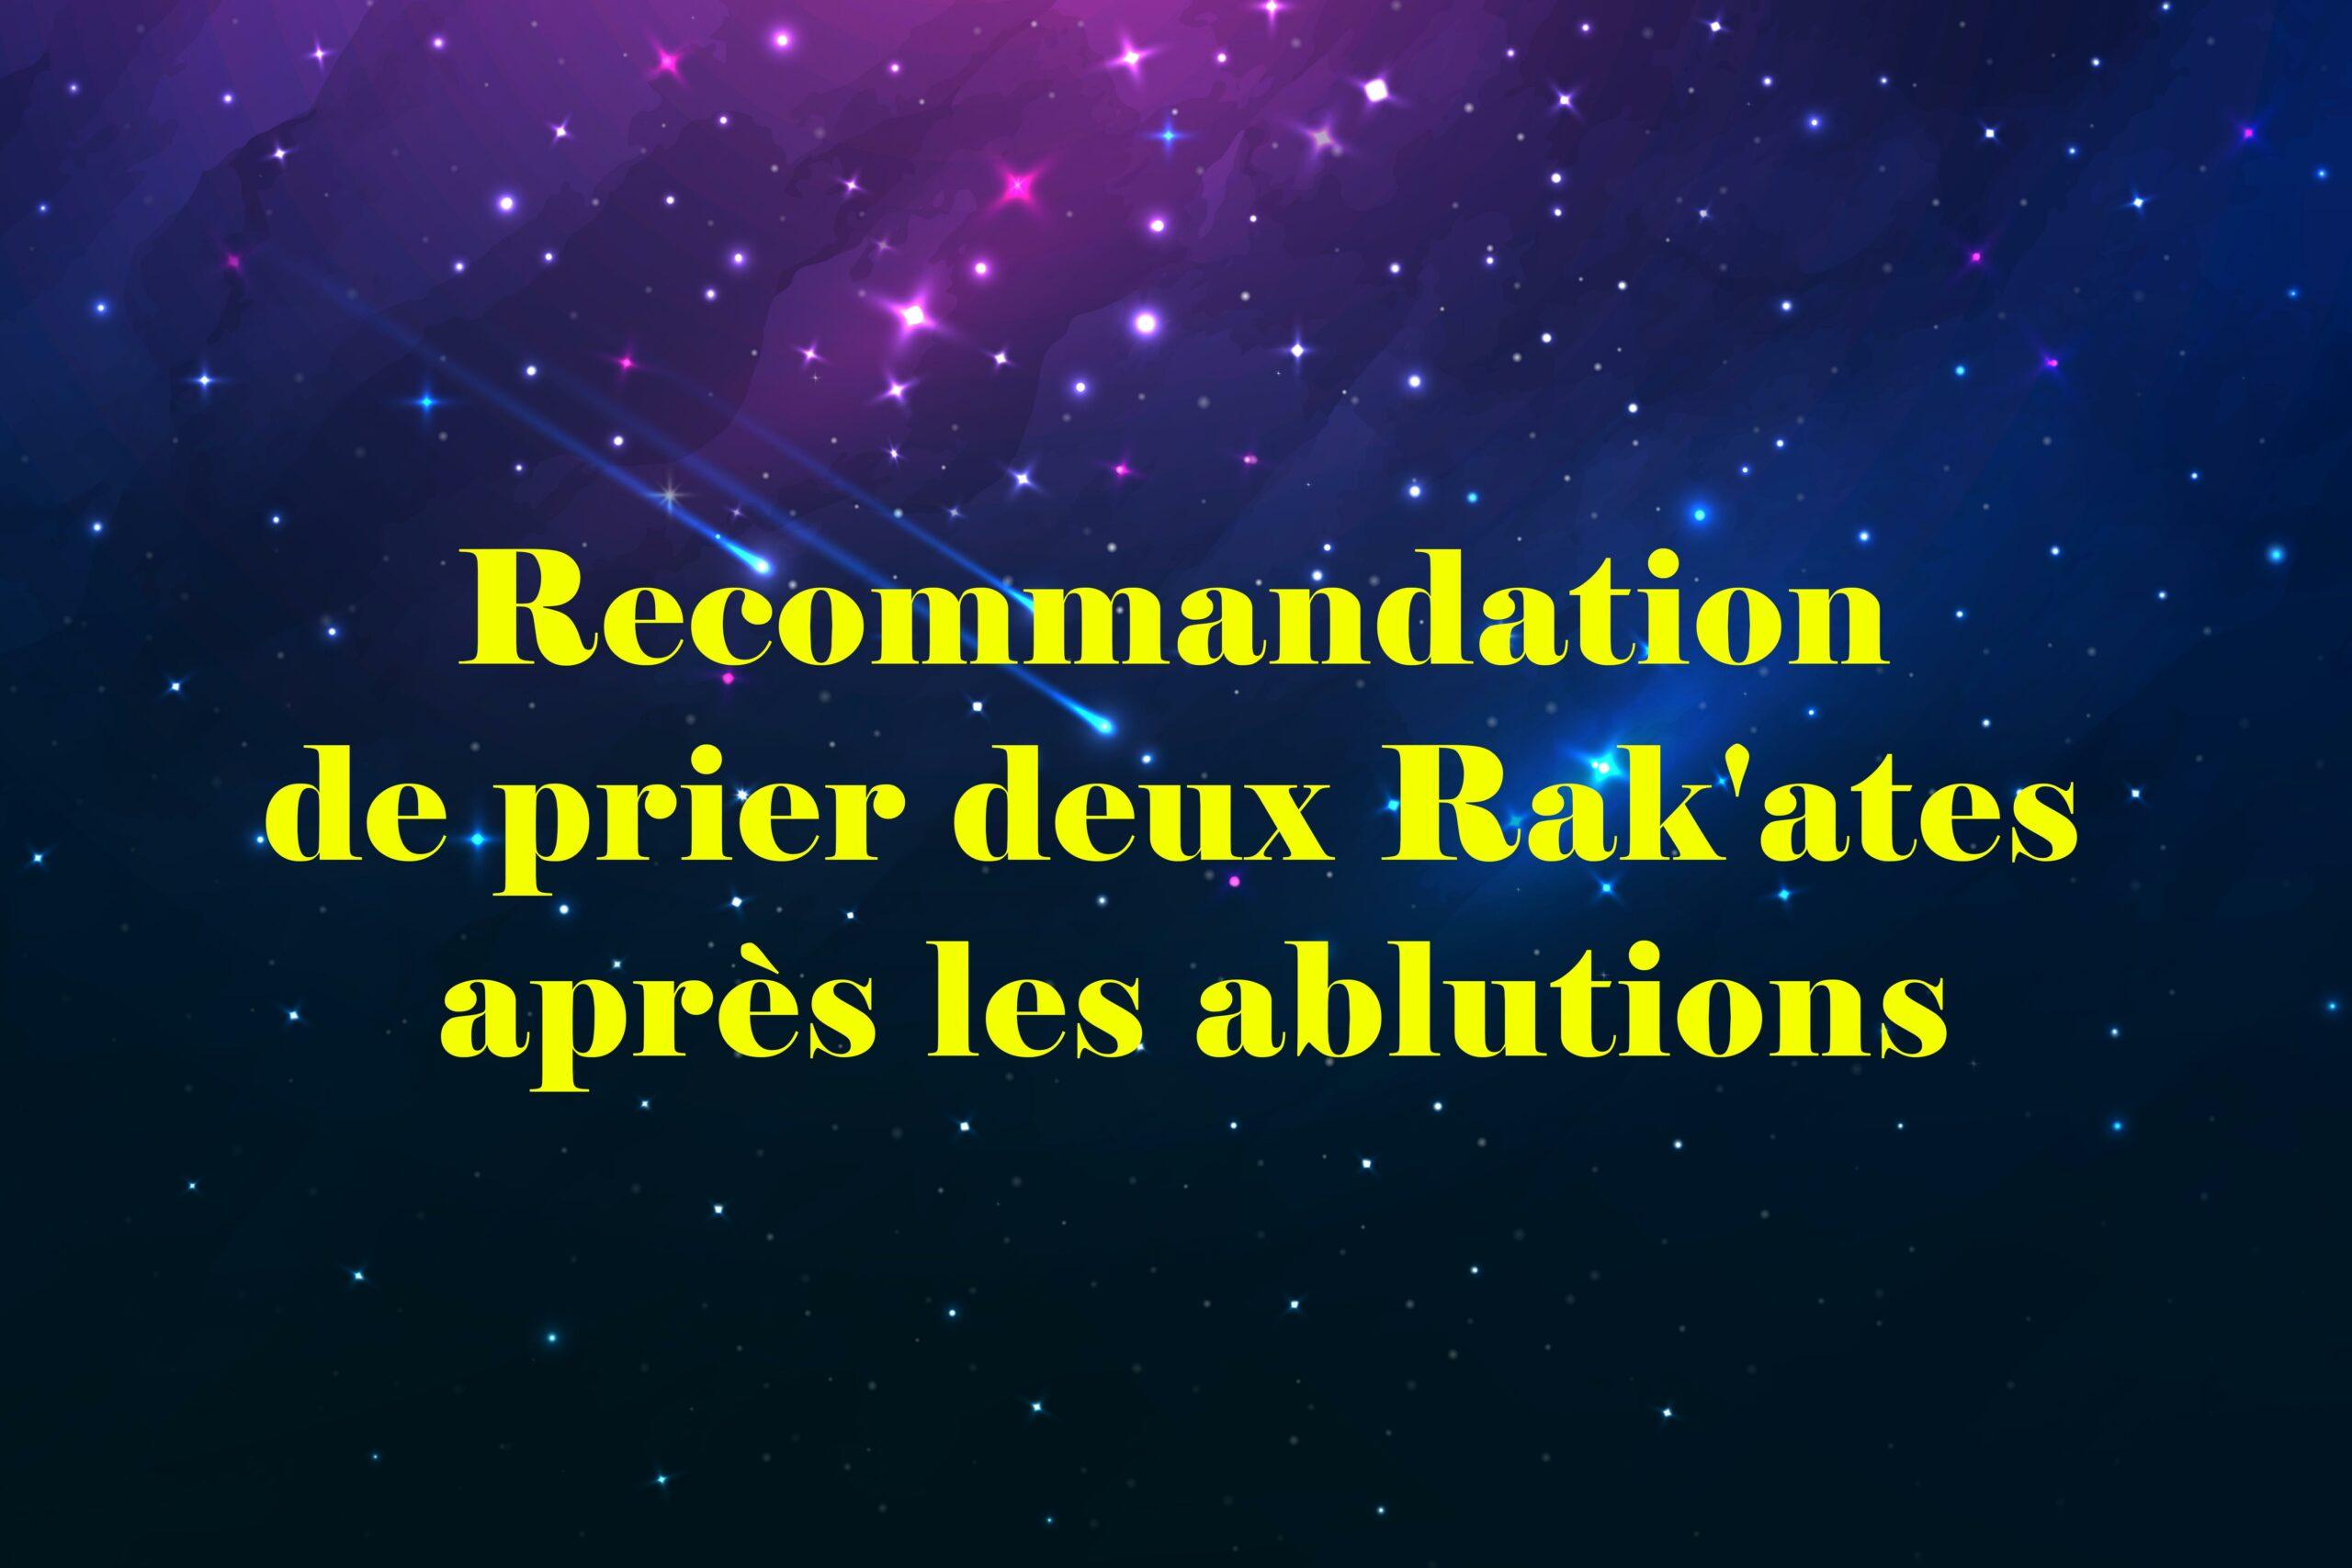 Recommandation de prier deux Rak'ates apres les ablutions